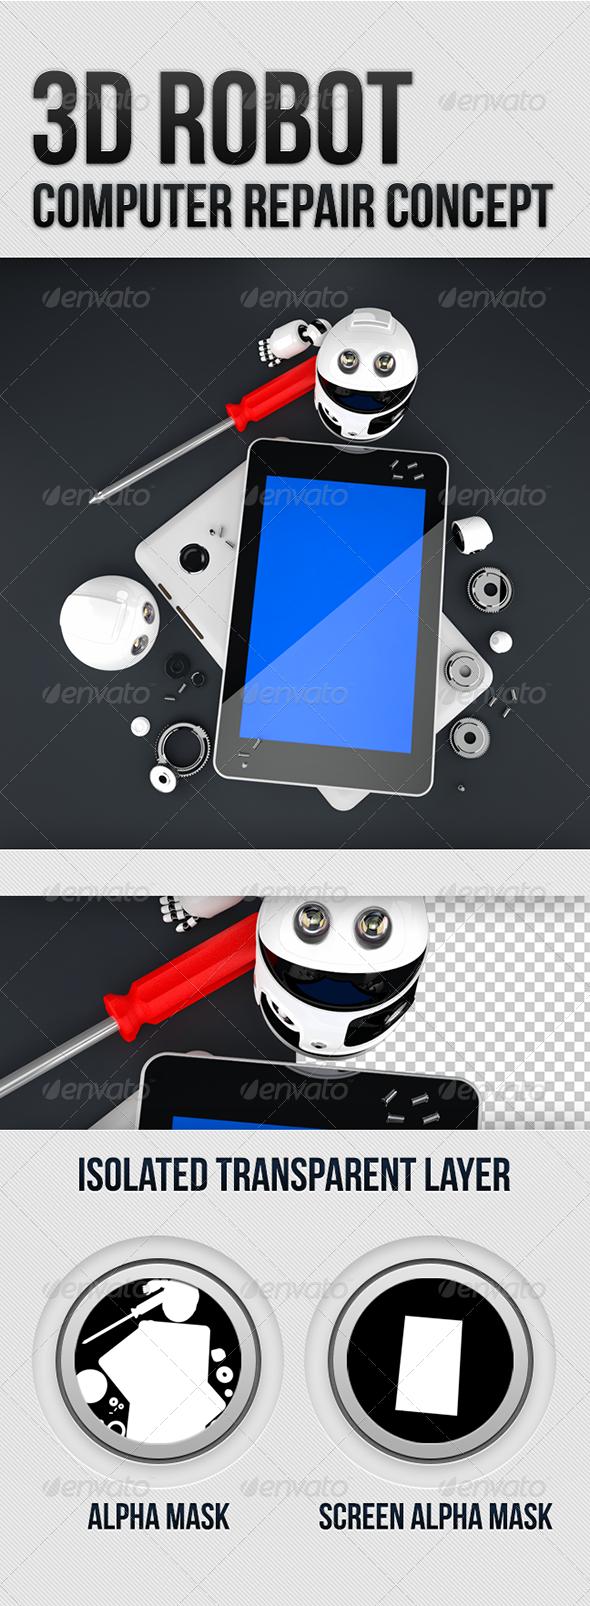 GraphicRiver 3D Robot Tablet Computer Repair Concept 5594057